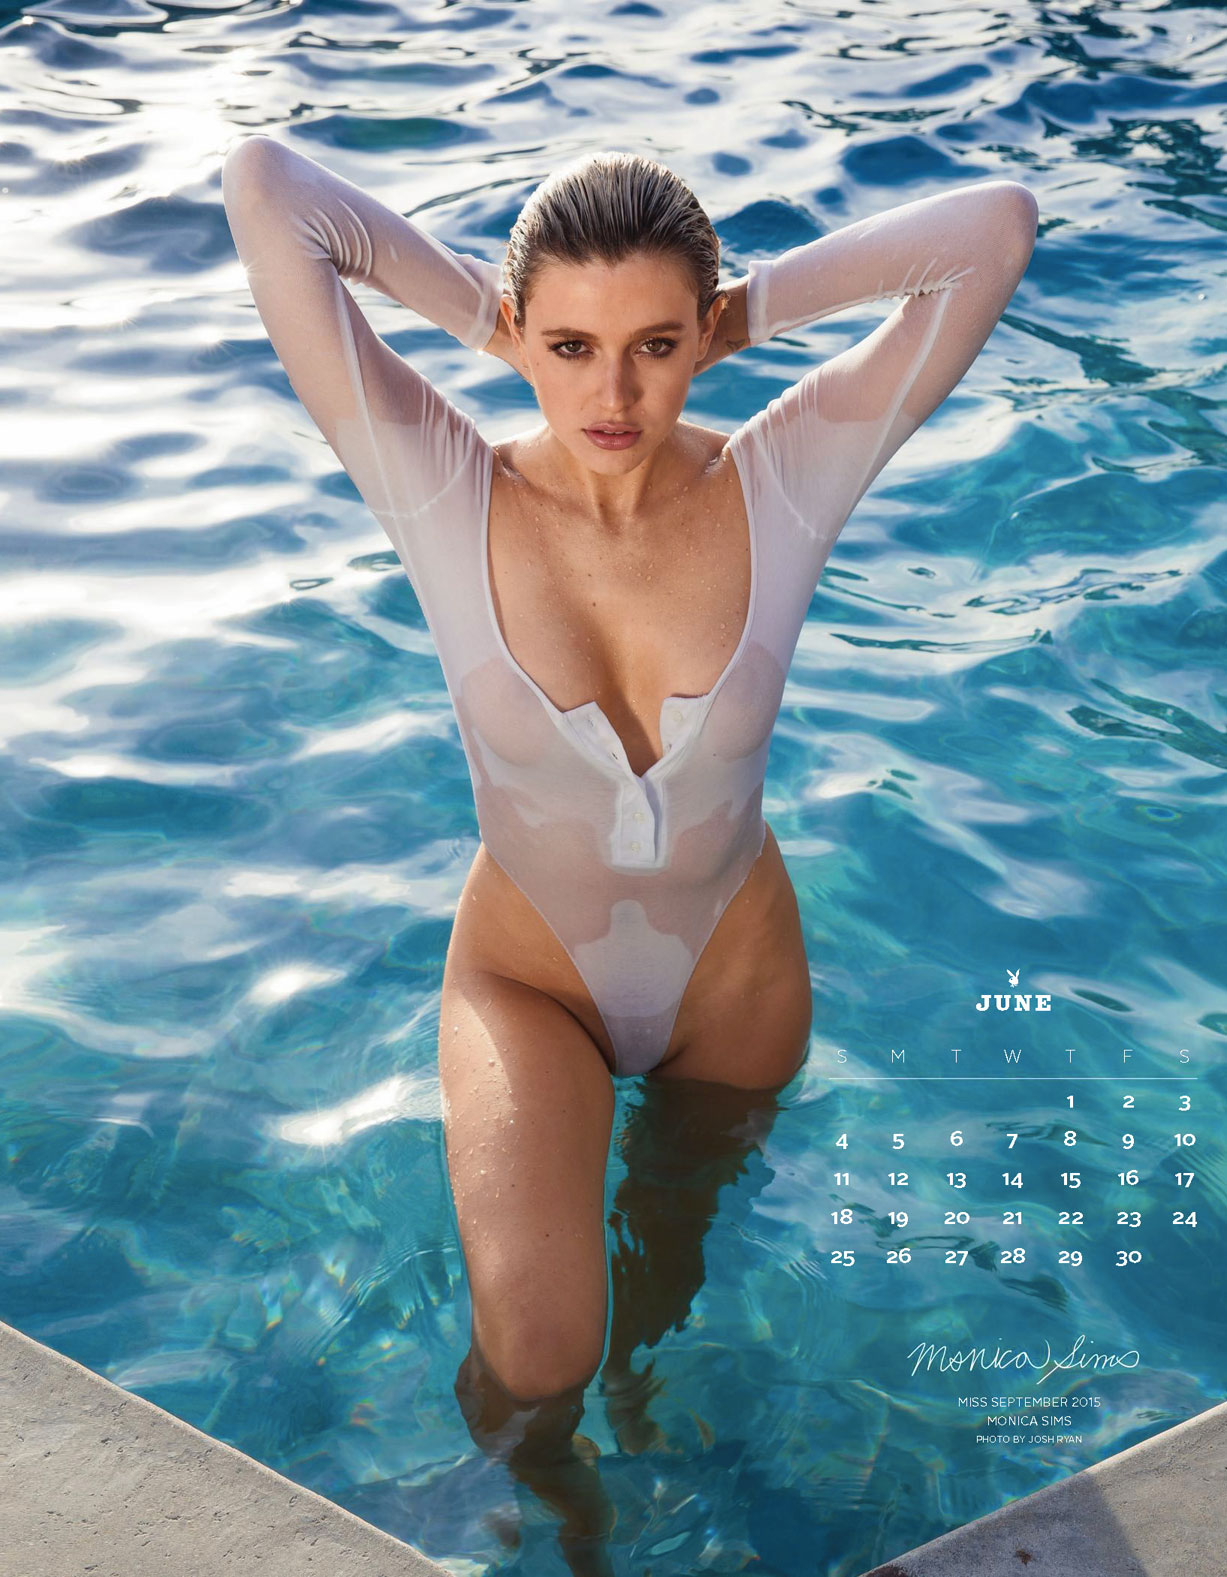 Playboy US Playmates 2017 calendar - Miss September 2015 Monica Sims / Моника Симс – Девушка месяца сентябрь 2015 журнала Плейбой США